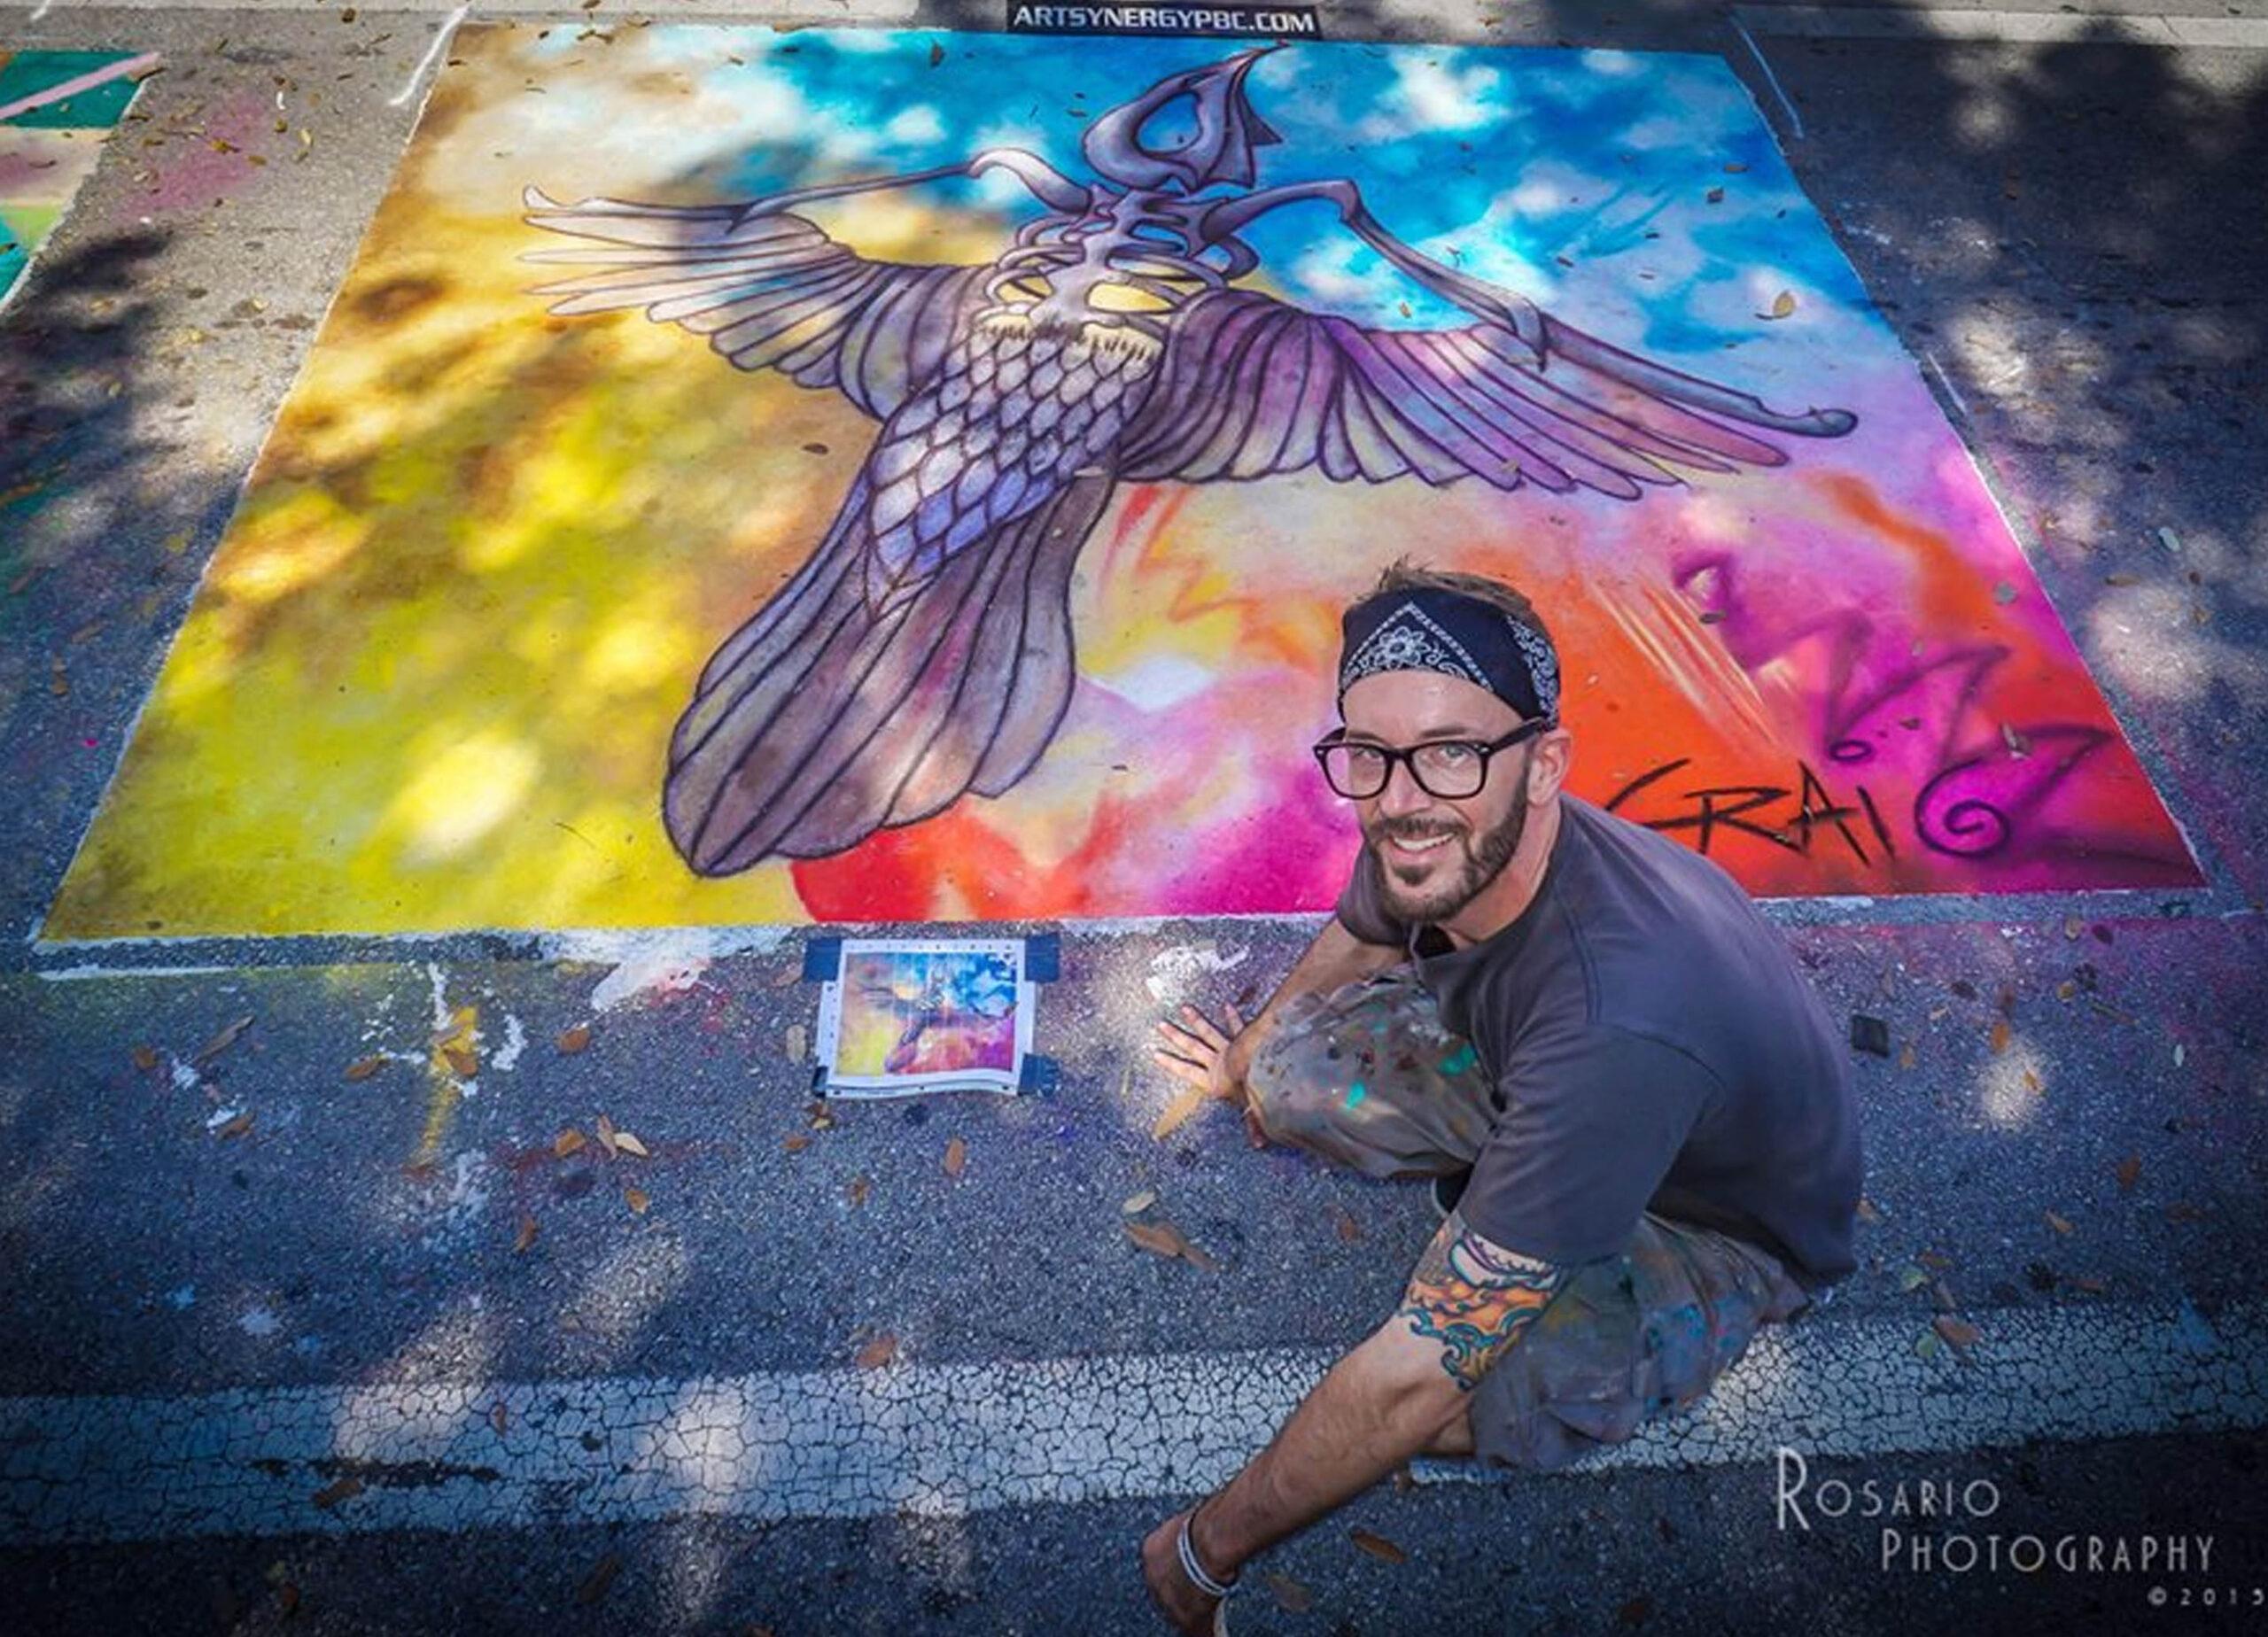 #184 Craig McInnis: Artist, Muralist, and Creative